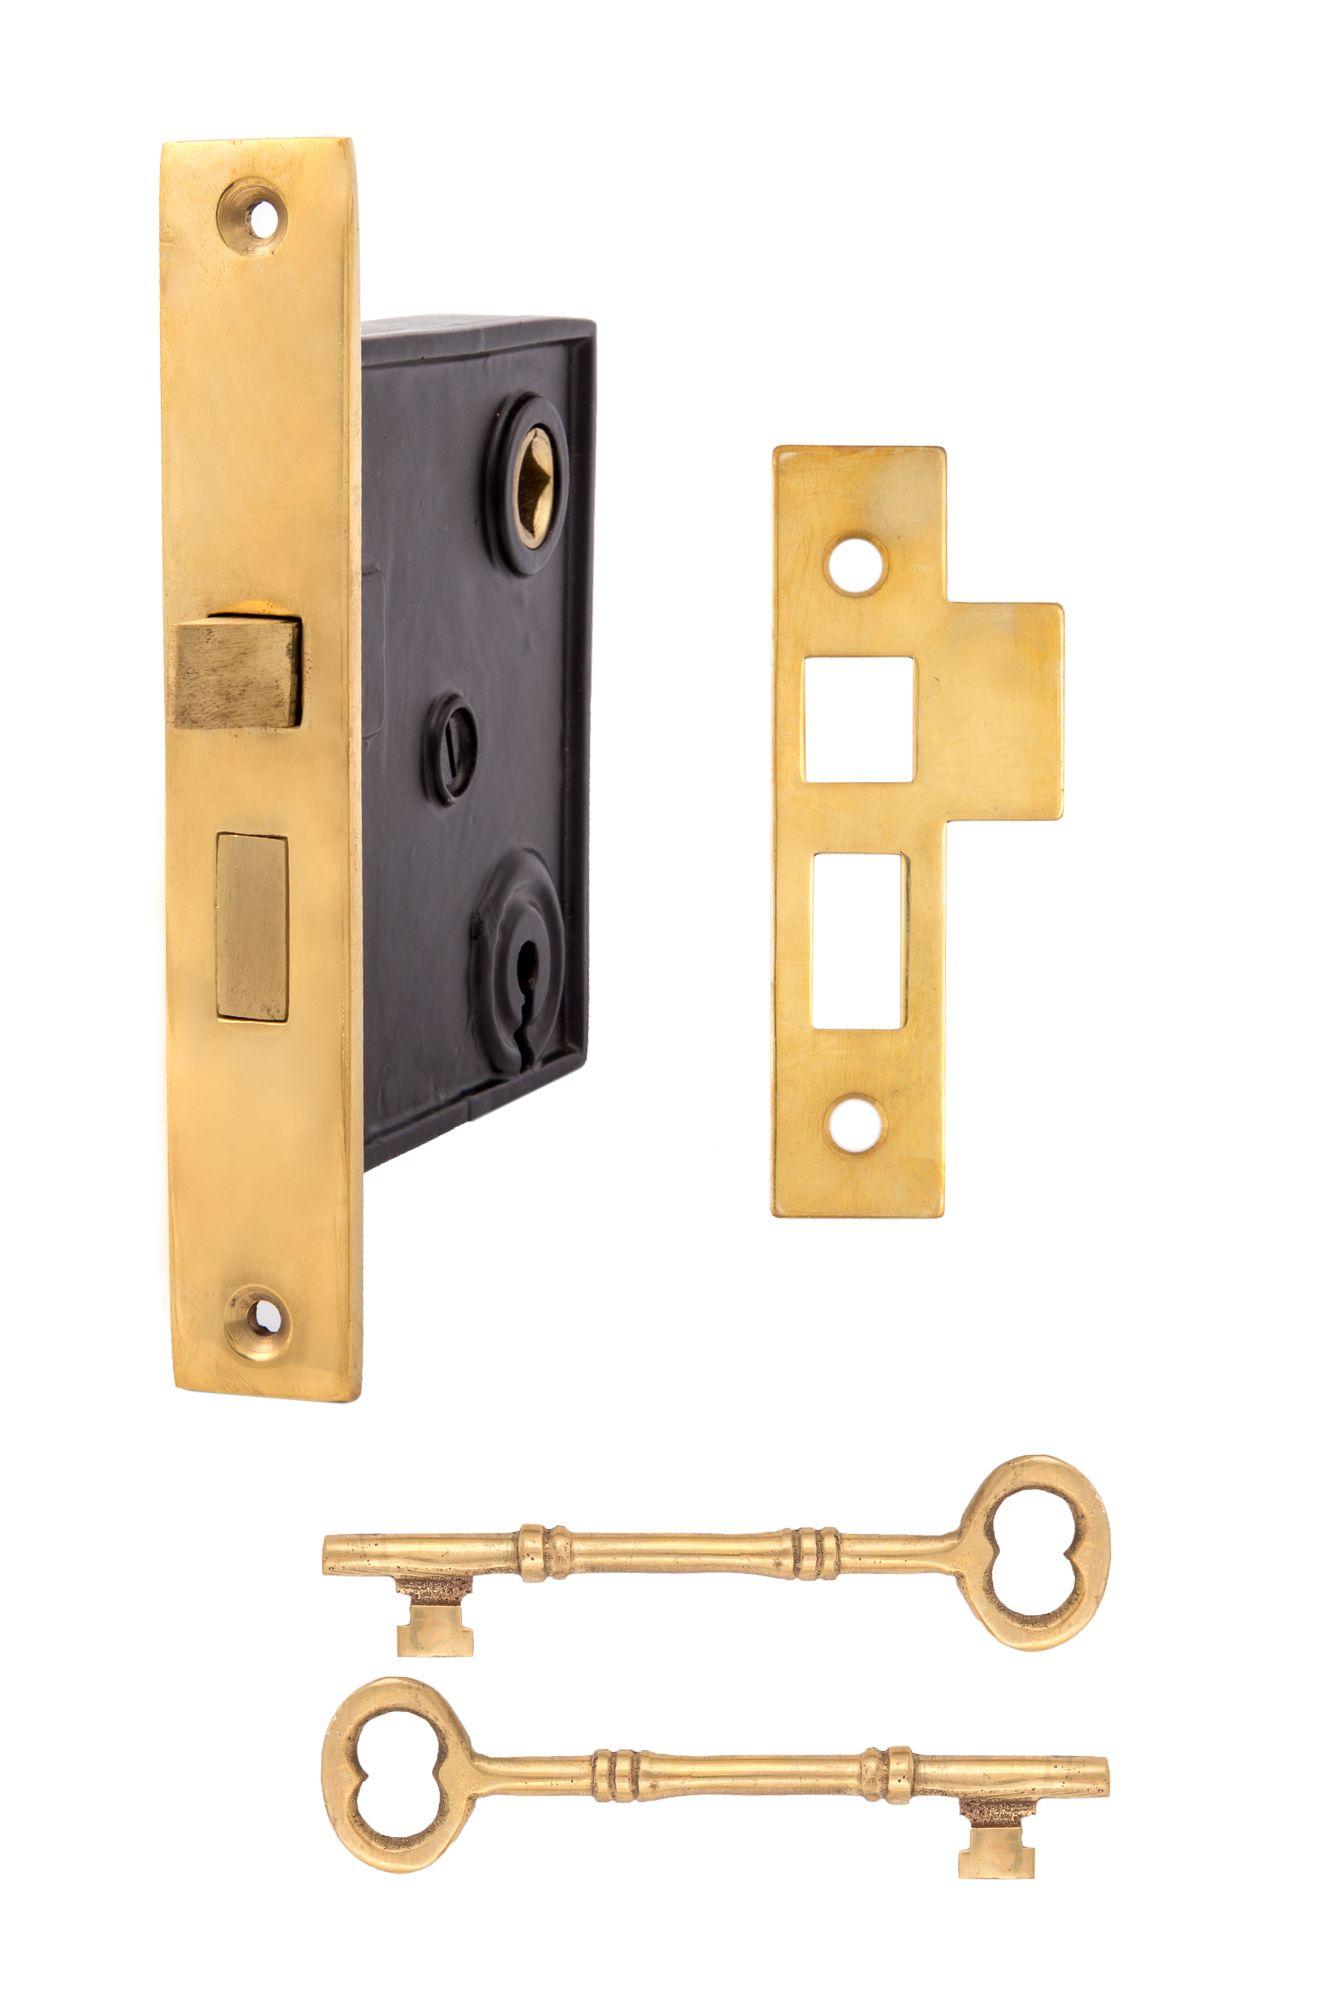 Keyed Mortise Lock 2807 Usxx Charleston Hardware Mortise Lock Antique Doors Mortice Lock